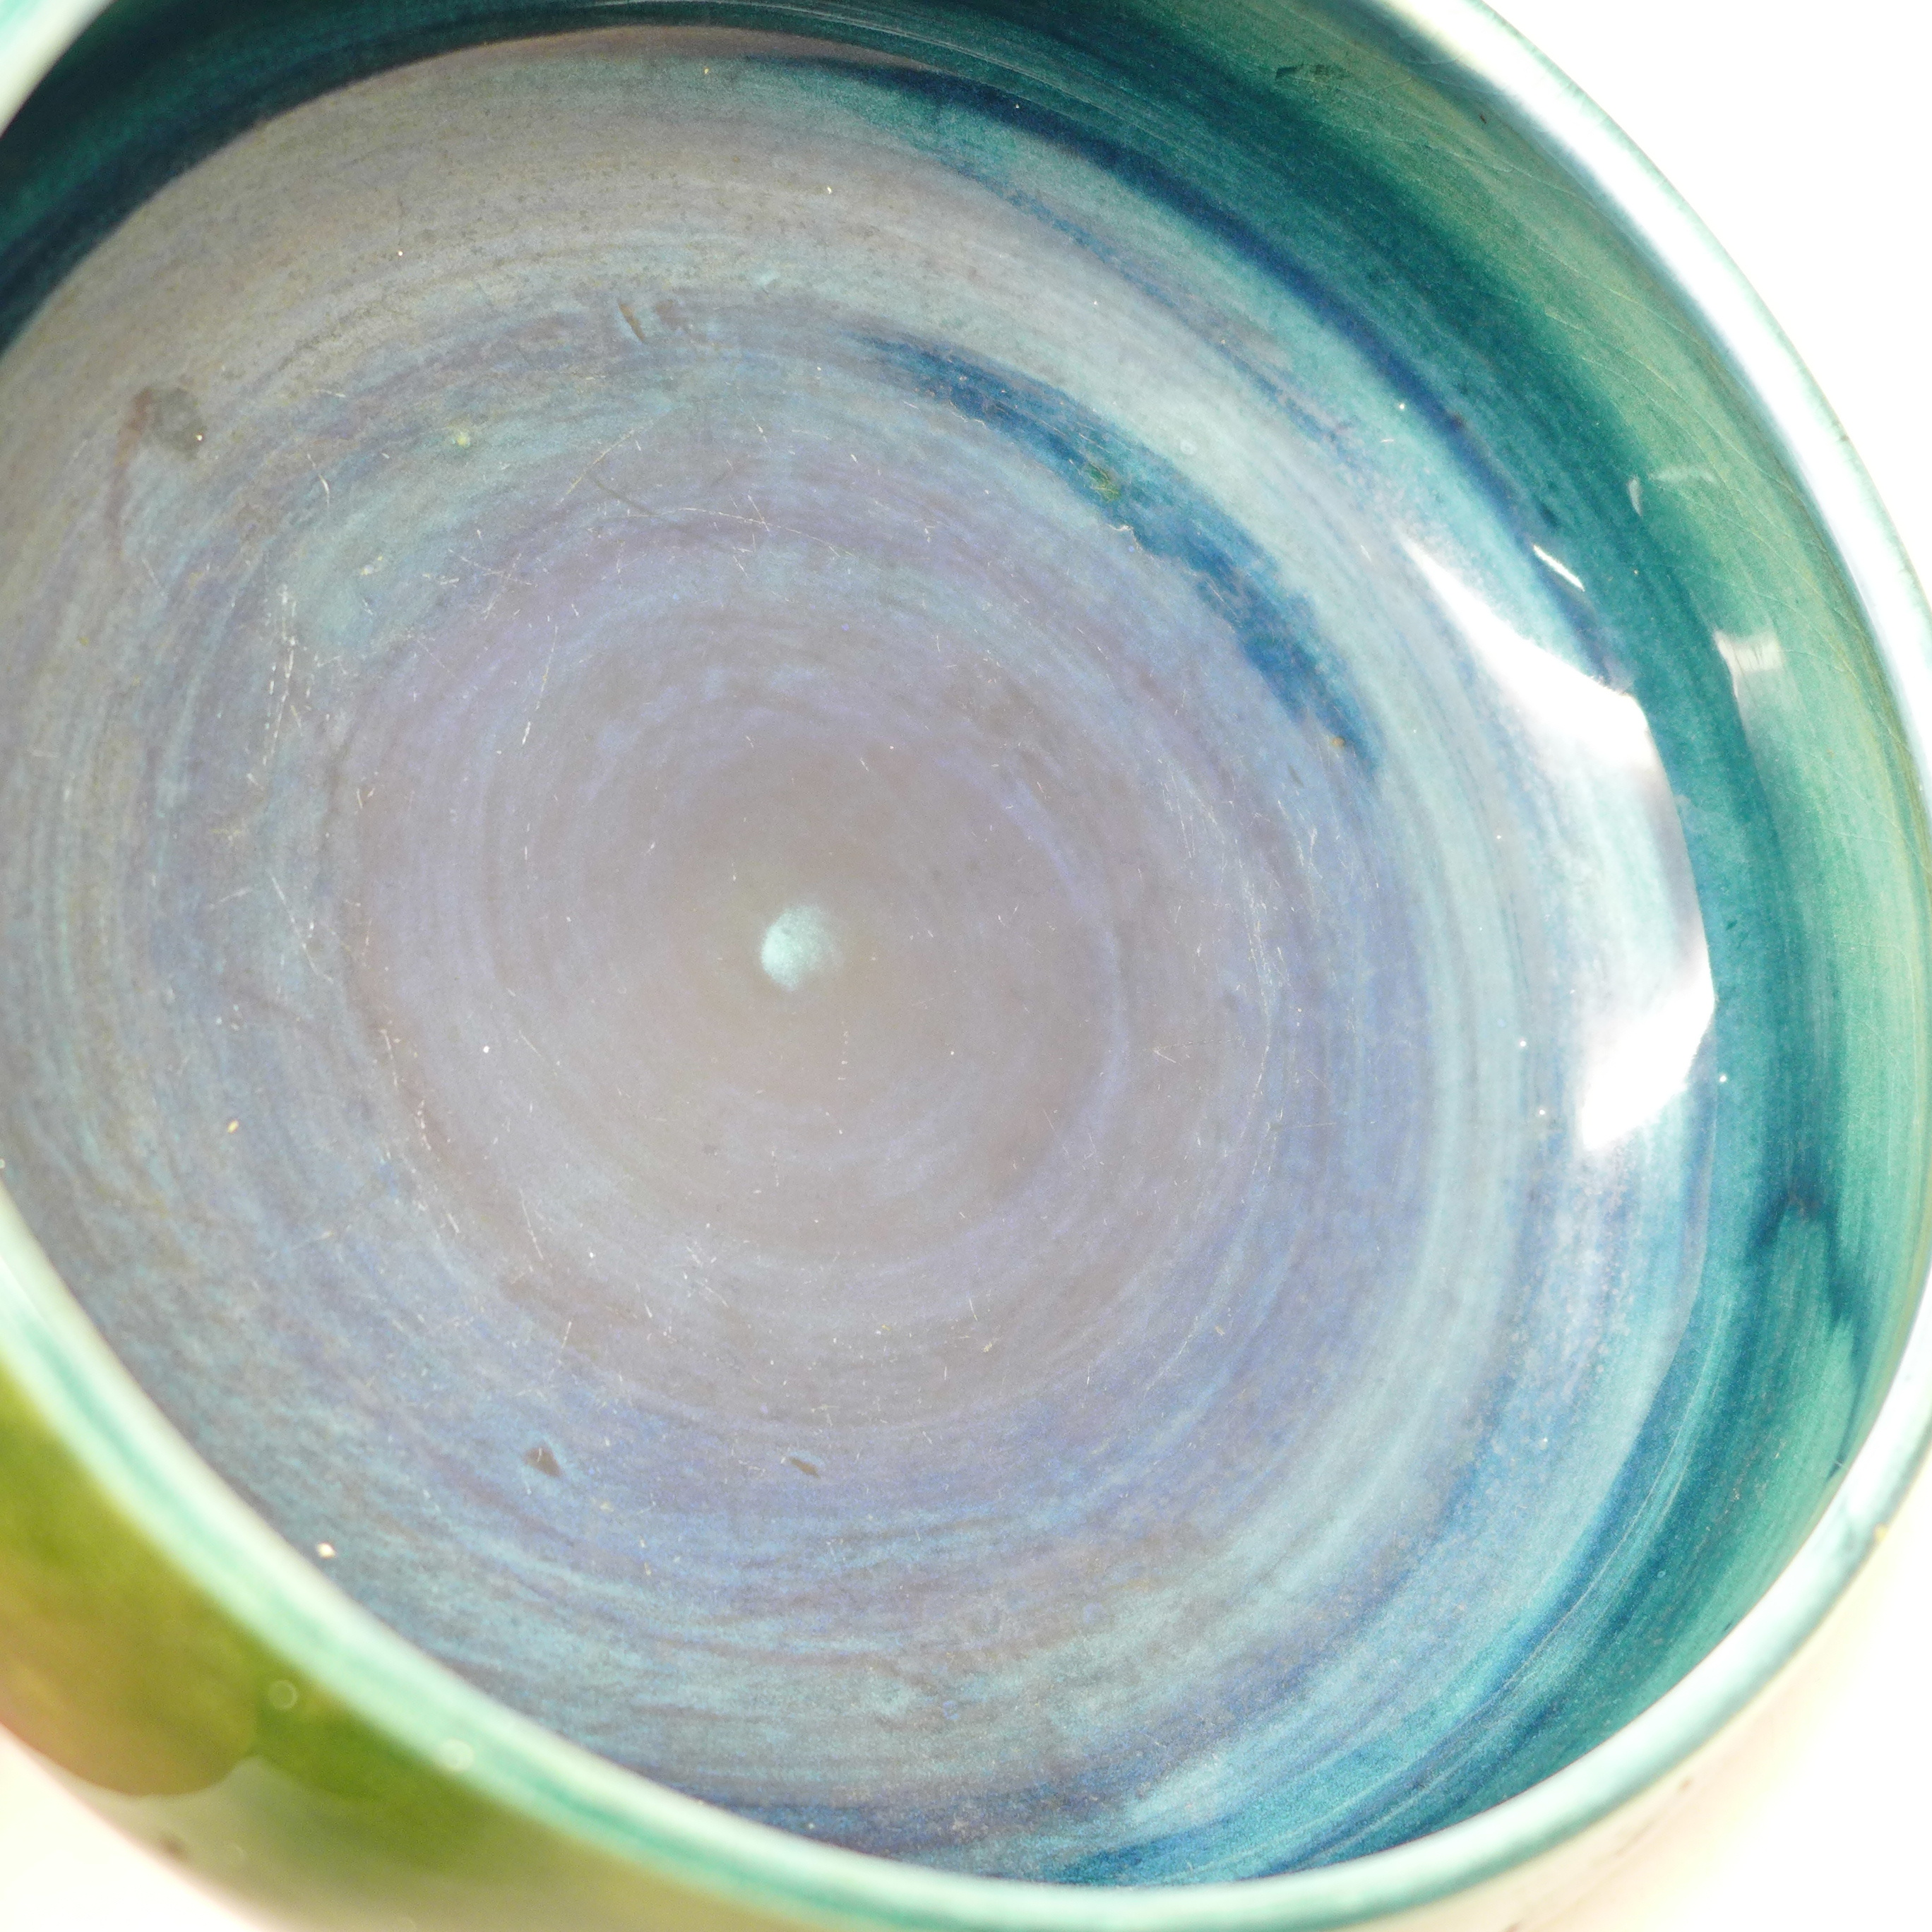 A Moorcroft anemone dish, 13.5cm diameter - Image 4 of 5